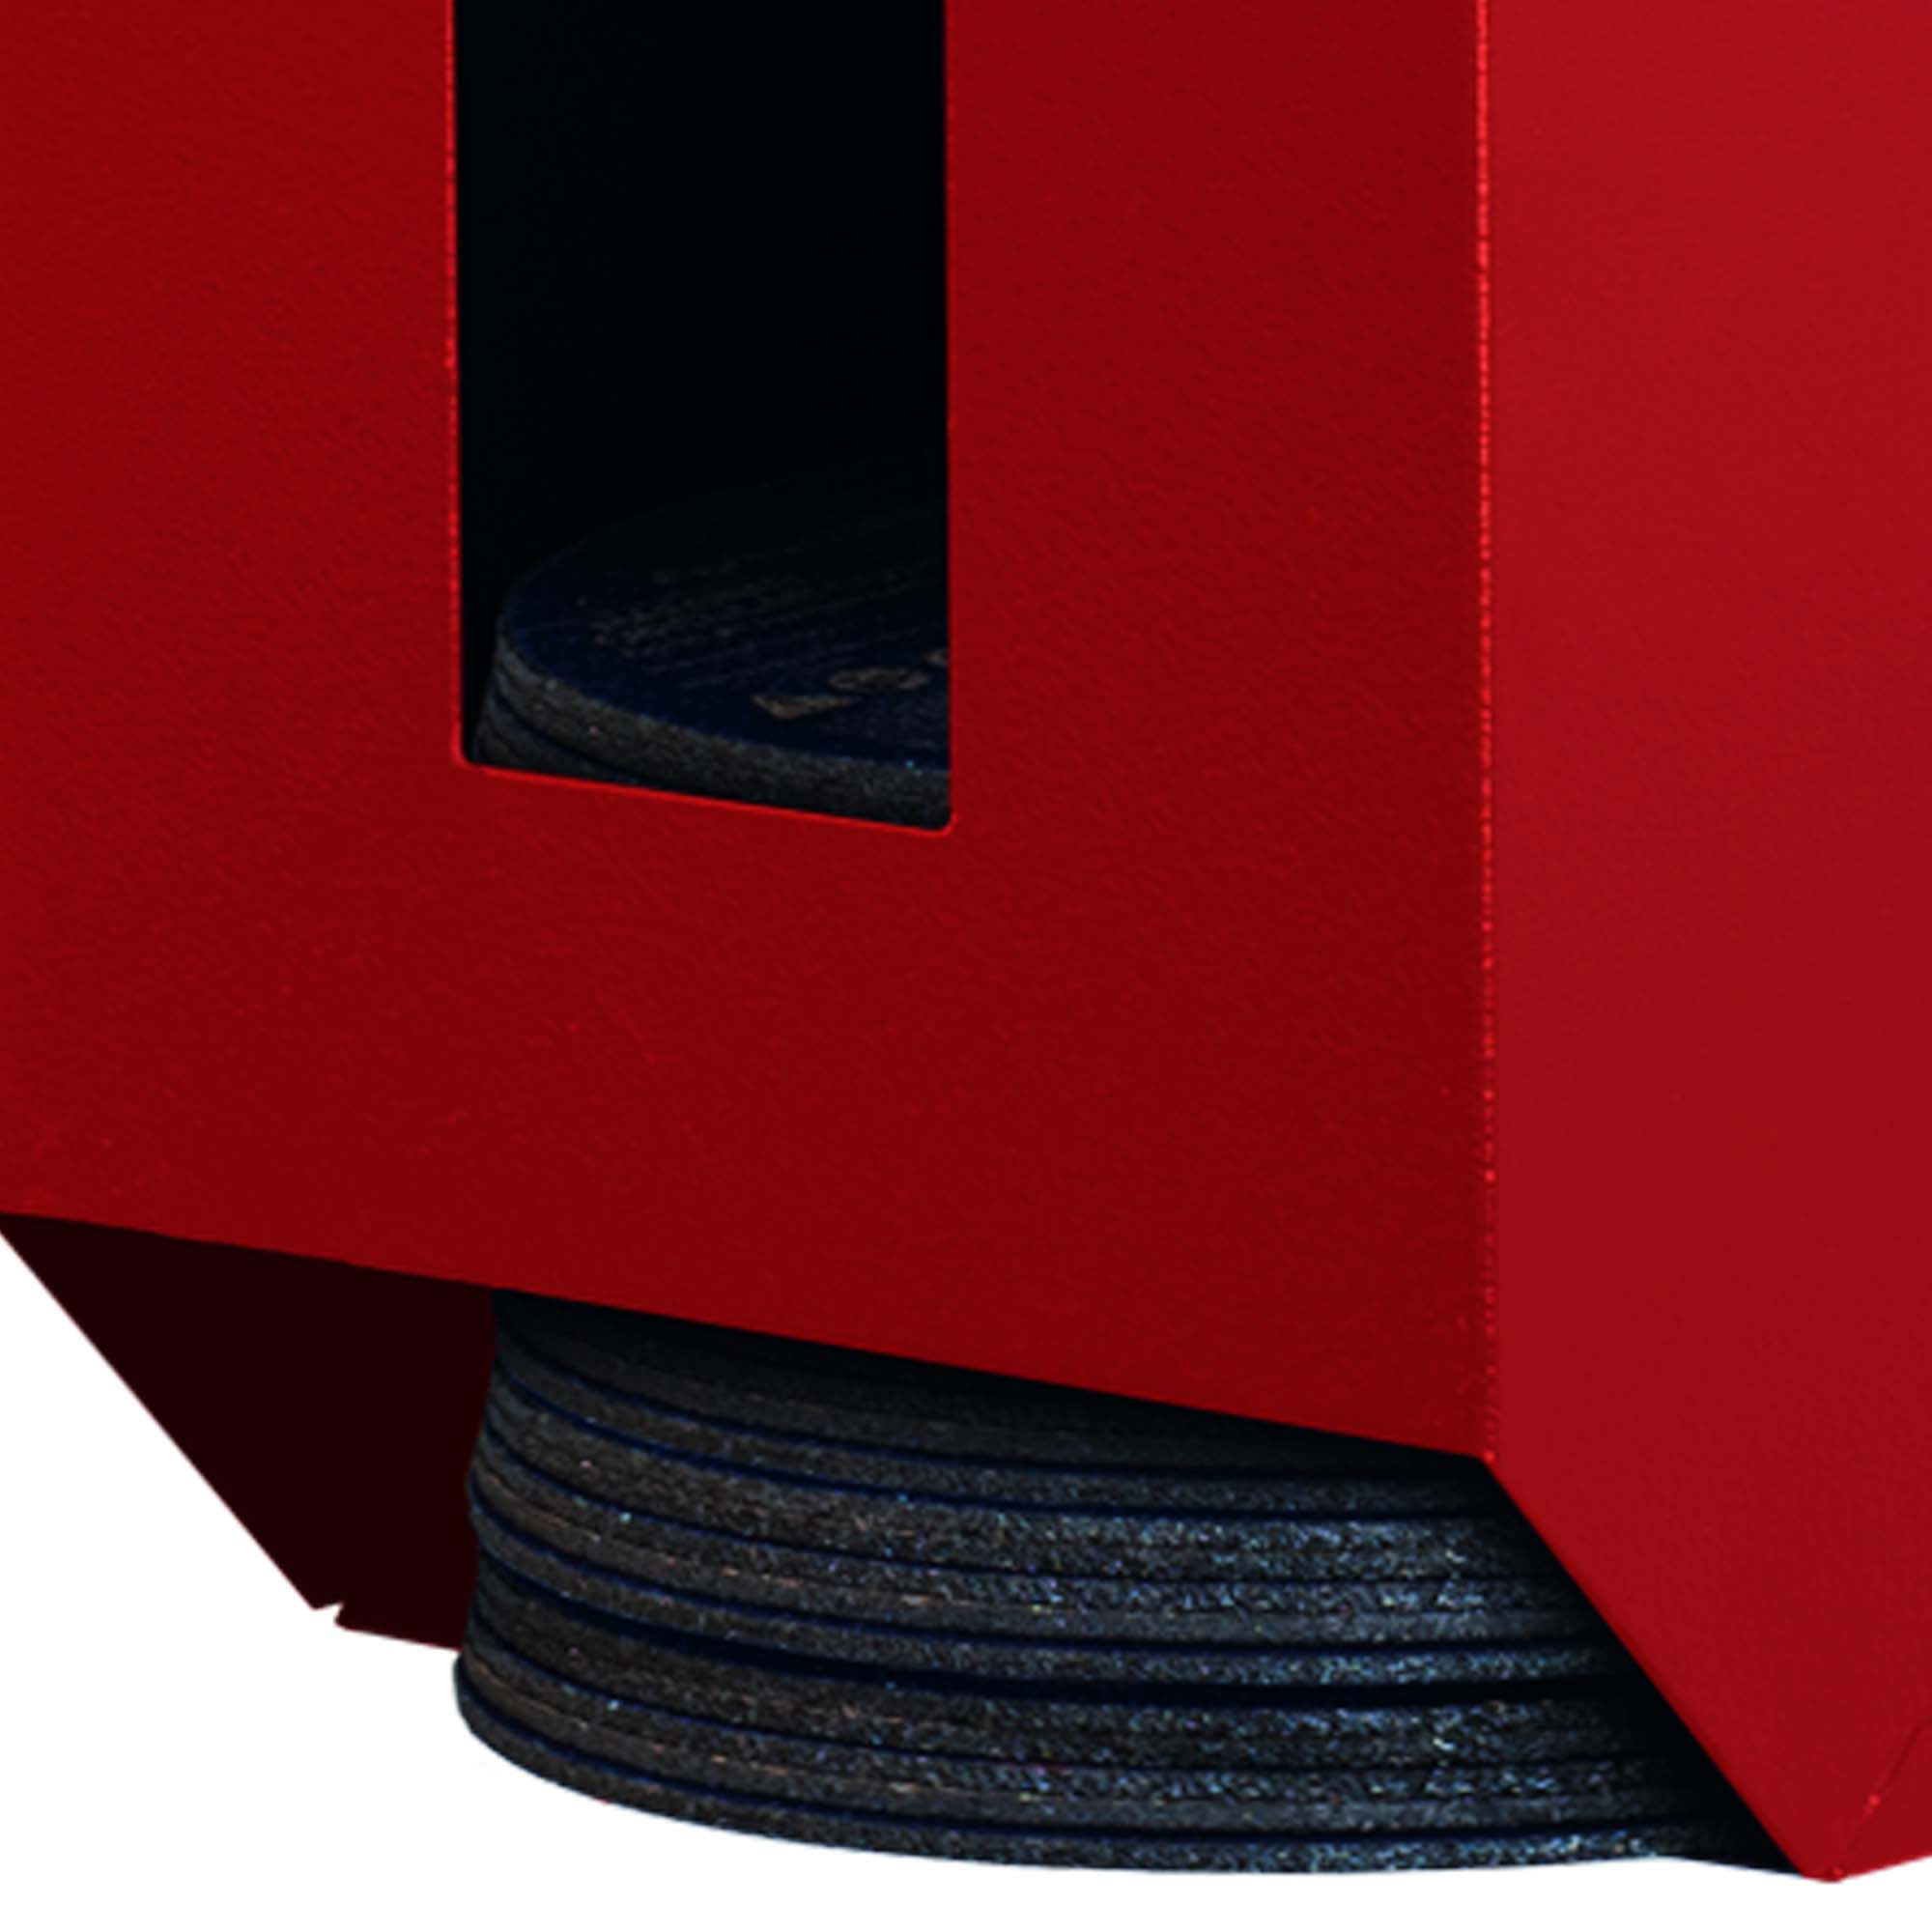 Craftline Storage System   Made In USA   PL-7DISC   7 Inch Grinder wheel dispenser